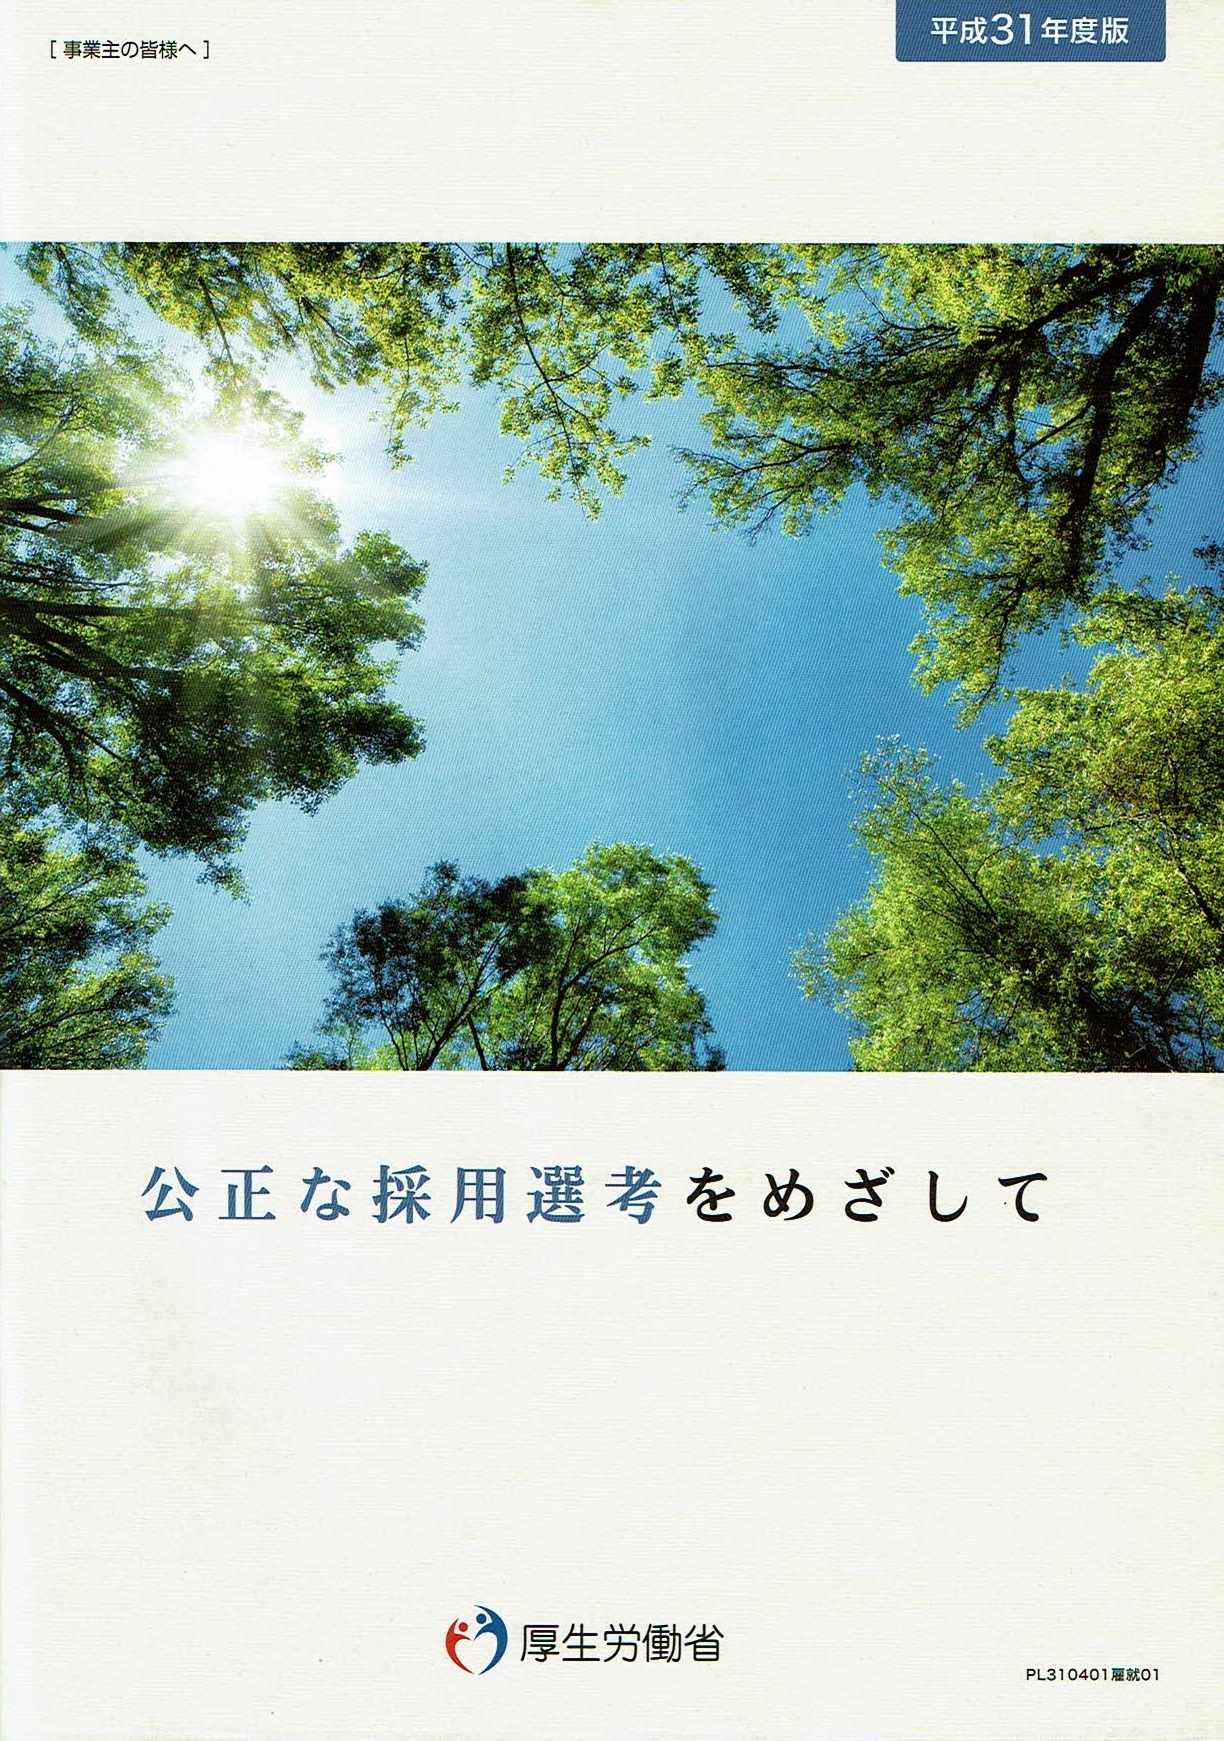 CCF_000035.jpg